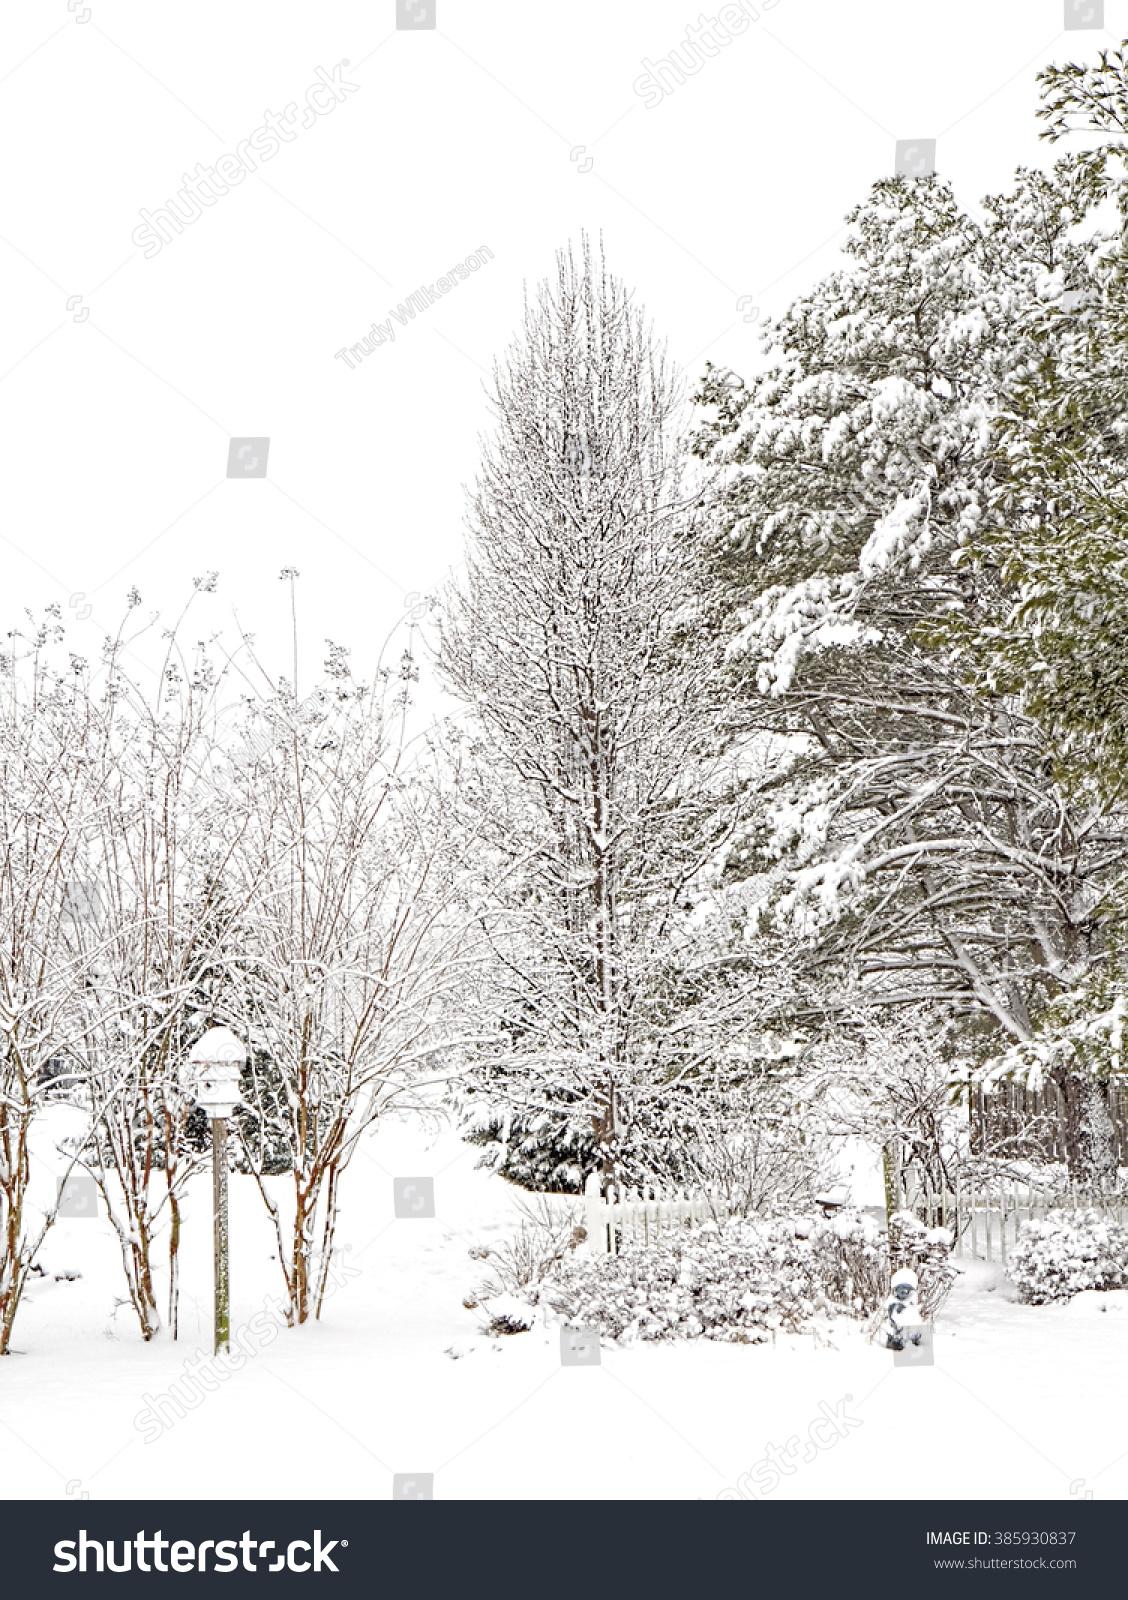 snow scene backyard garden stock photo 385930837 shutterstock